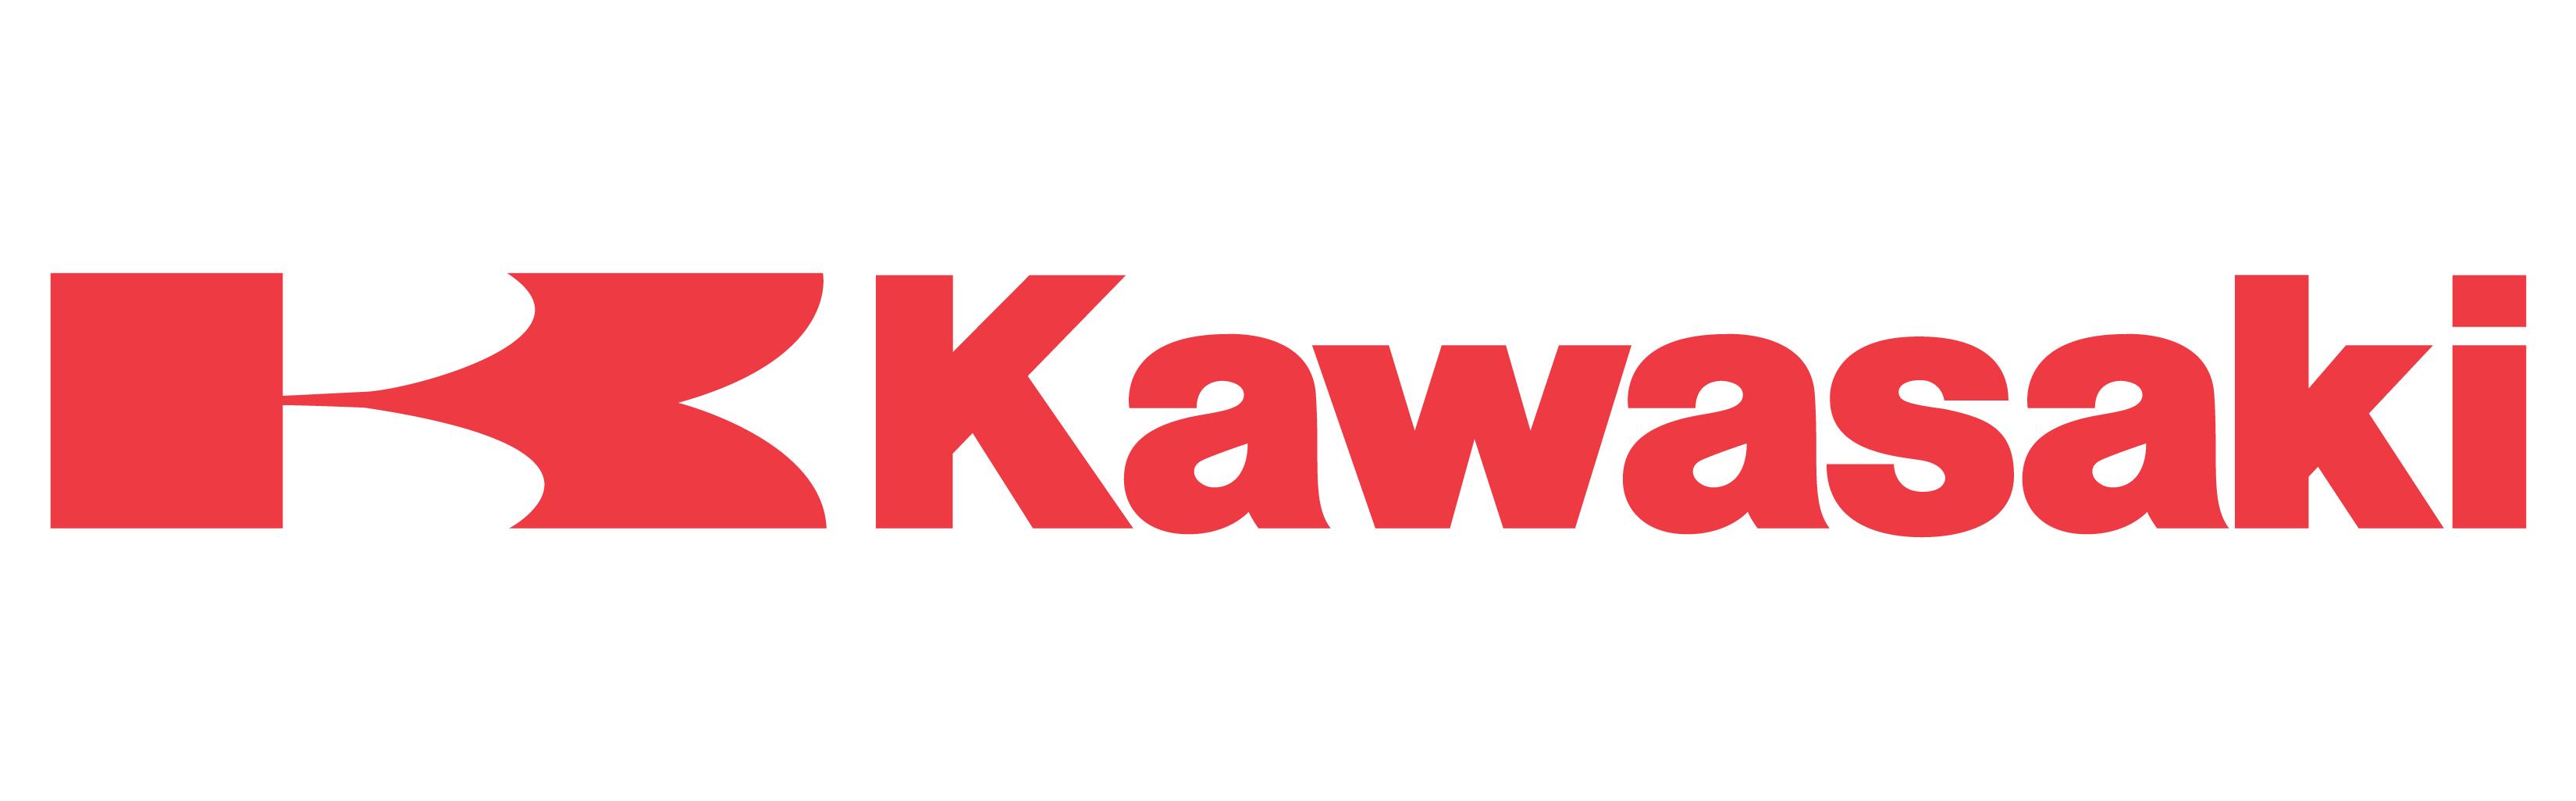 k-kawasakired-logo-11.jpg